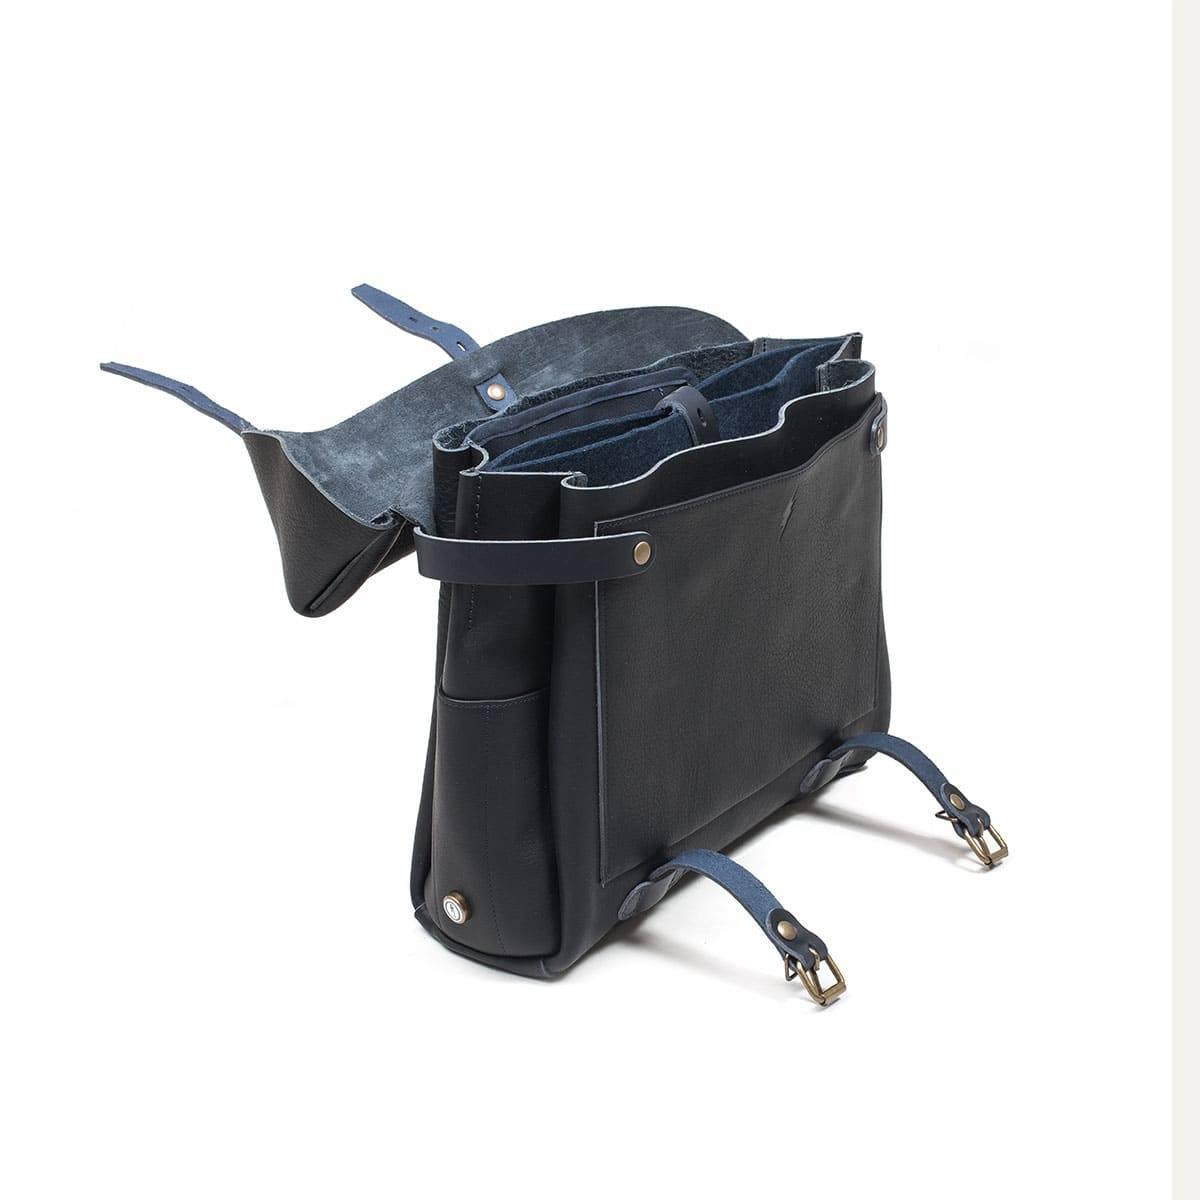 Bleu de Chauffe x Blitz Eclair bag - Navy (image n°8)